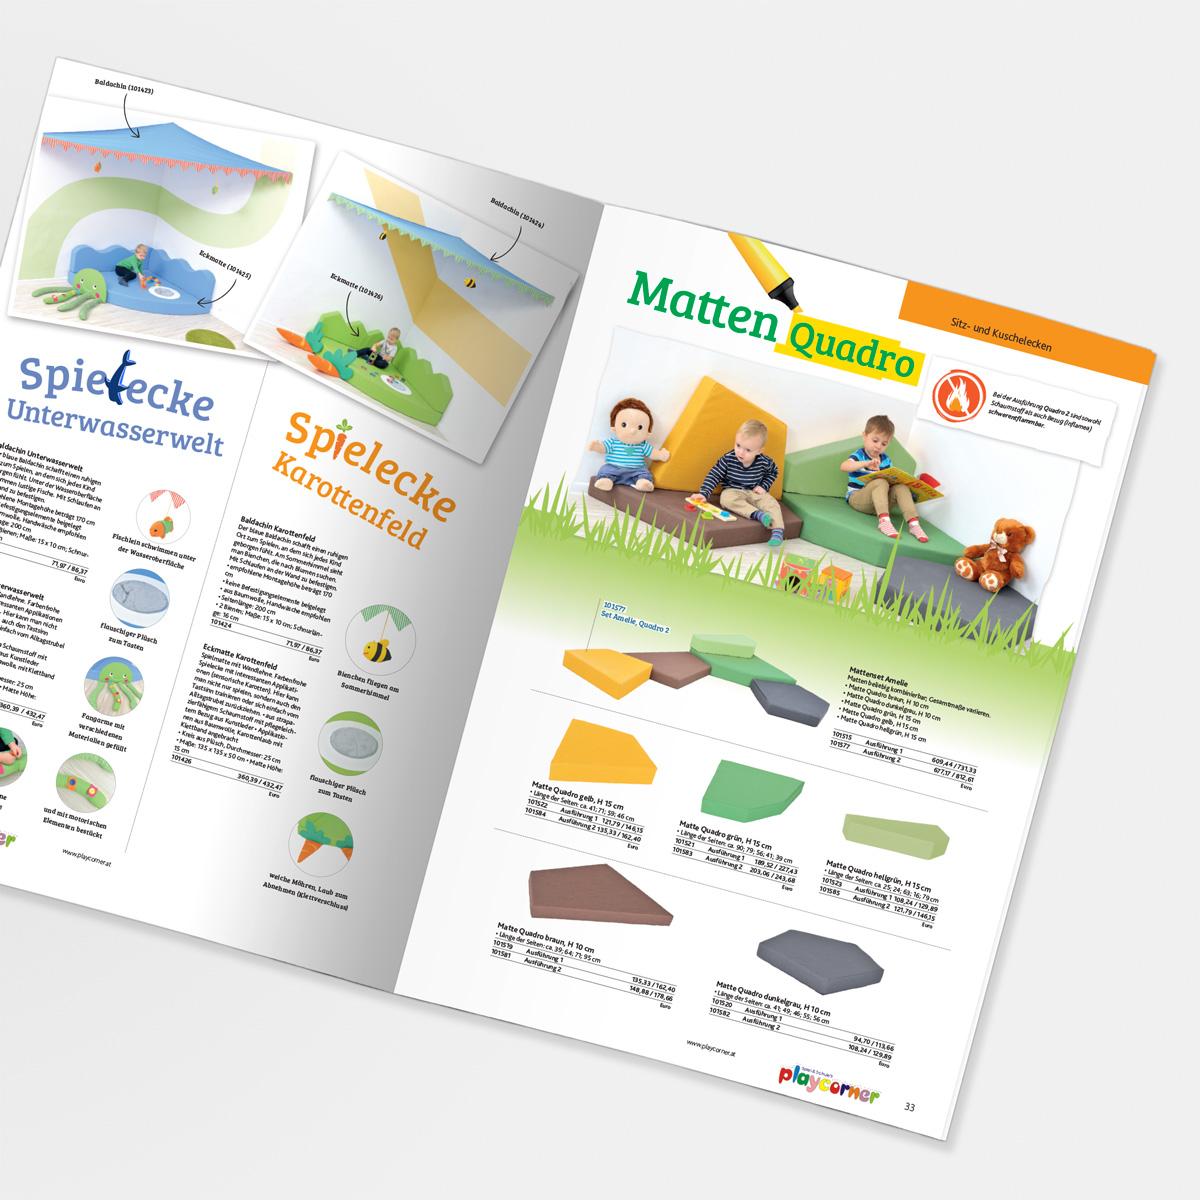 Spiel schule artina design for Schule design